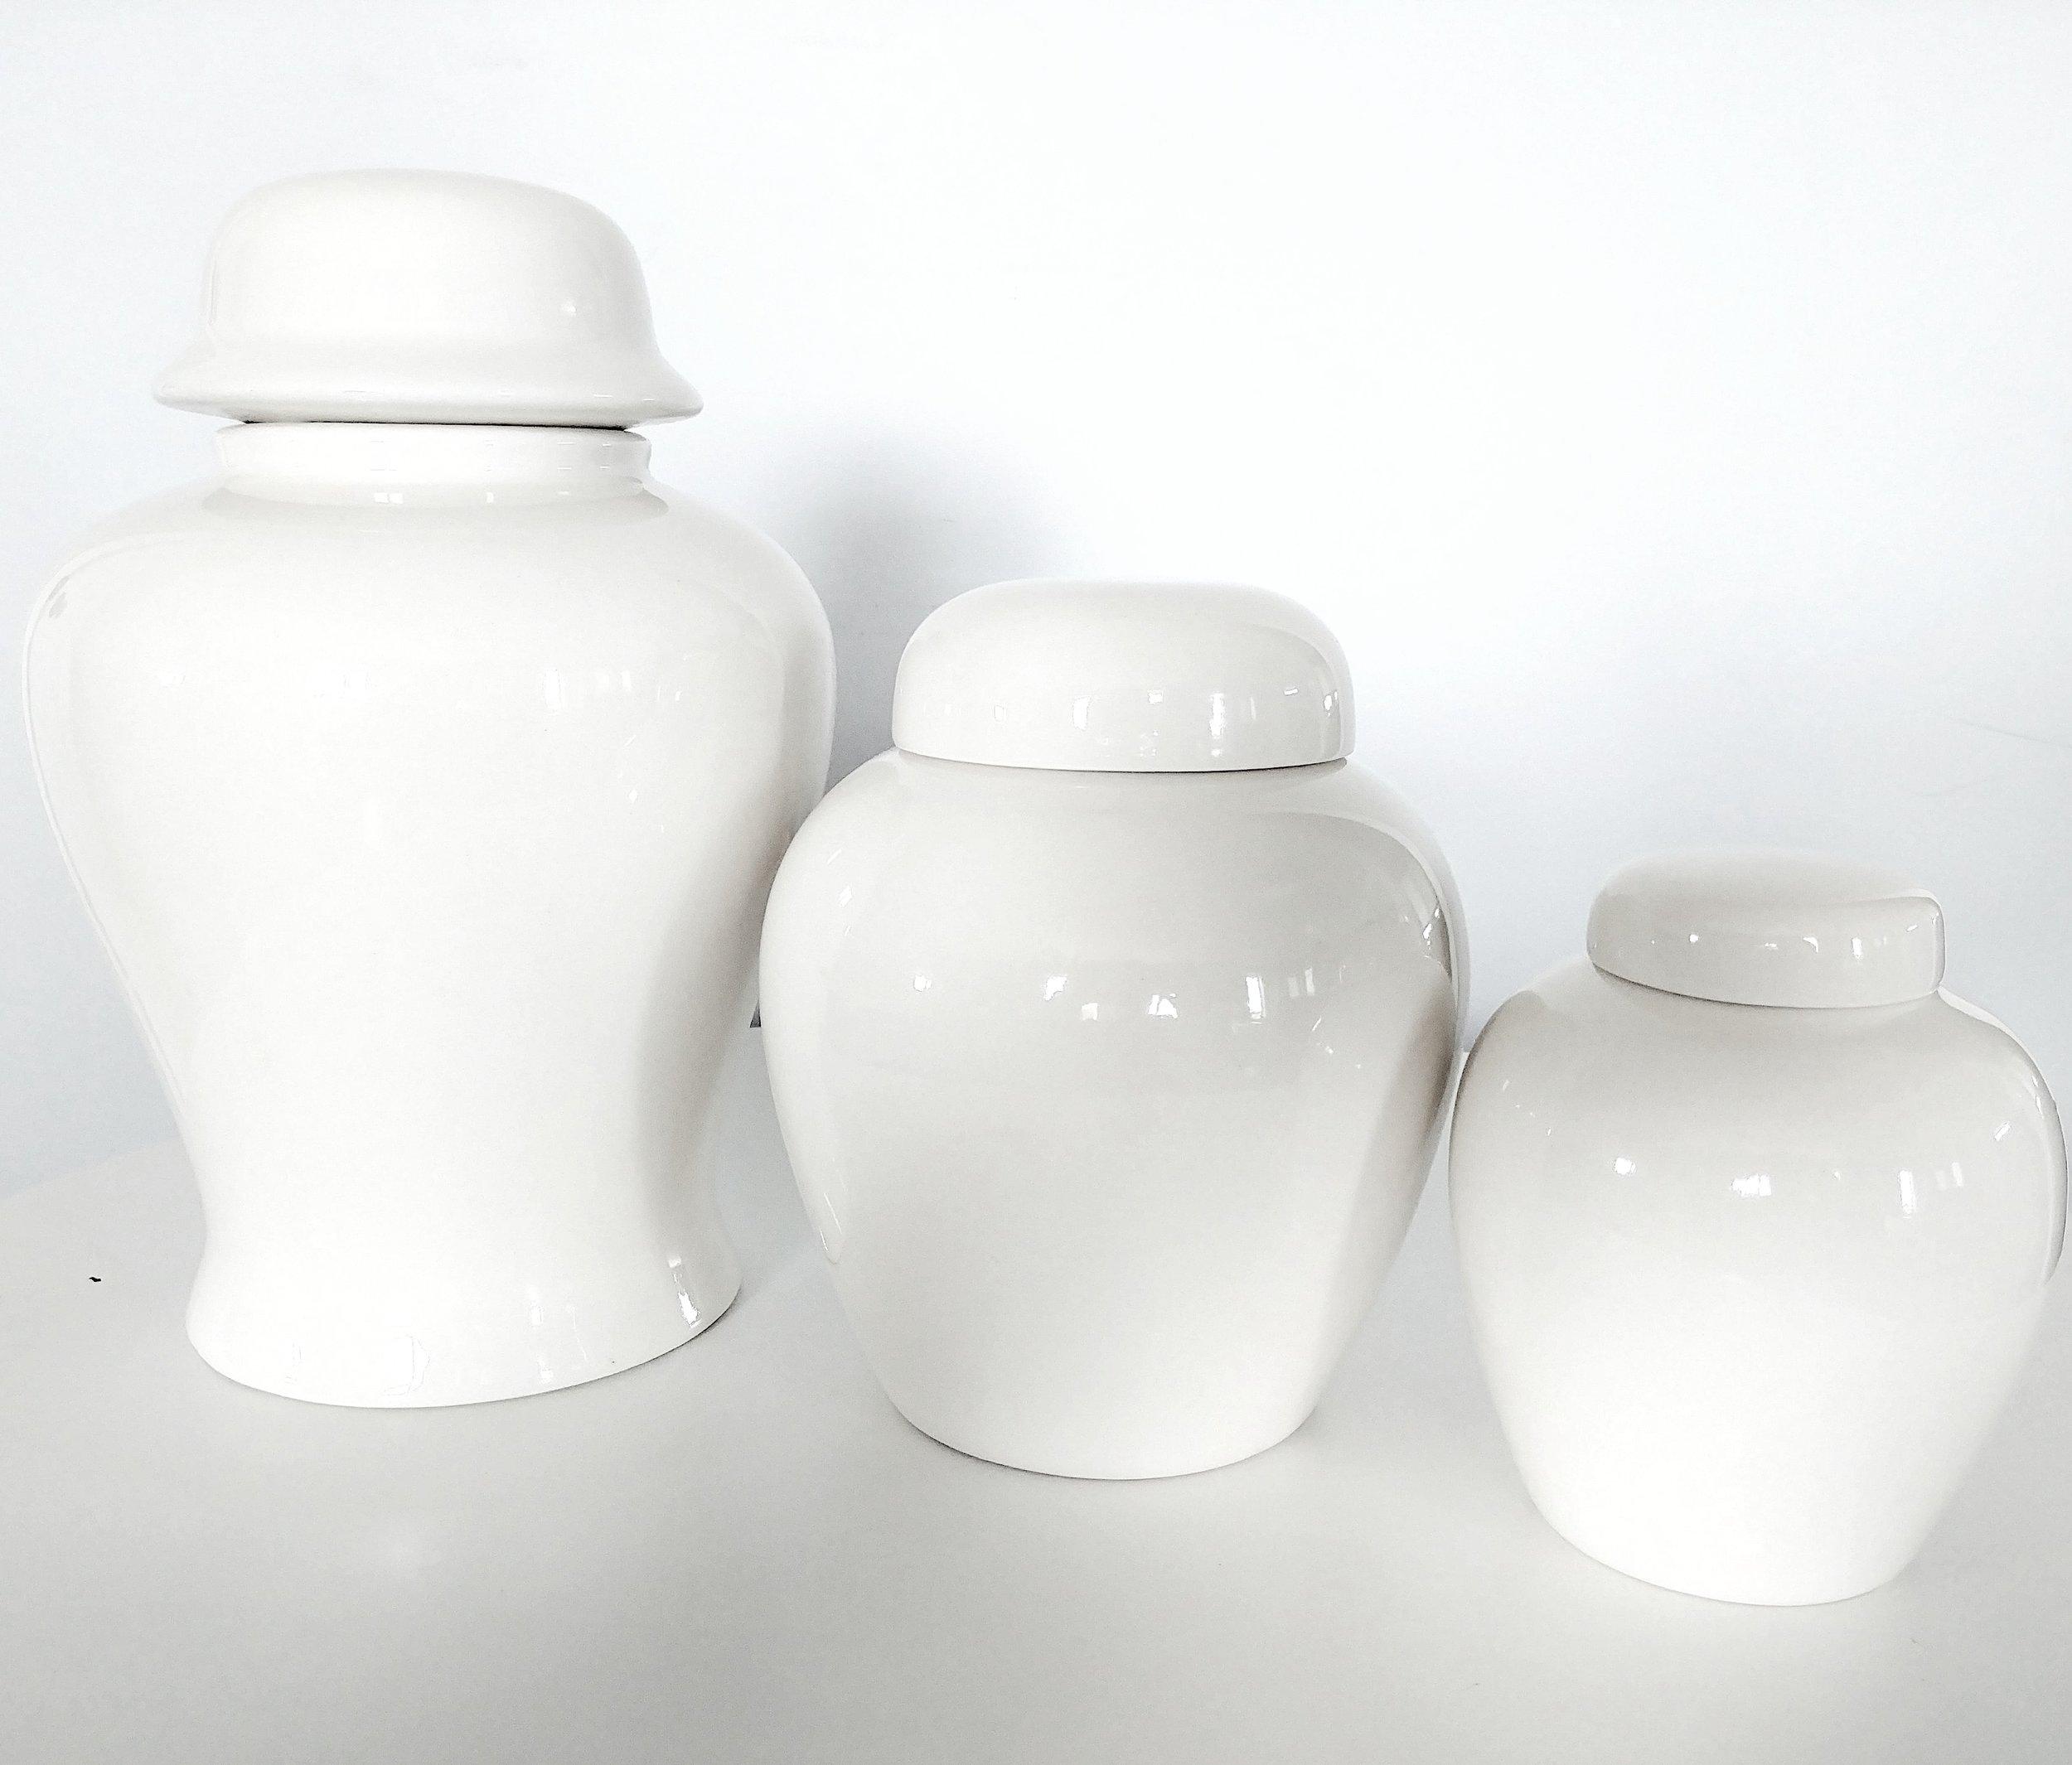 White Ceramic Urn - S(0-30Lbs)  $45M(31-65Lbs)  $65L(66-120Lbs)  $85